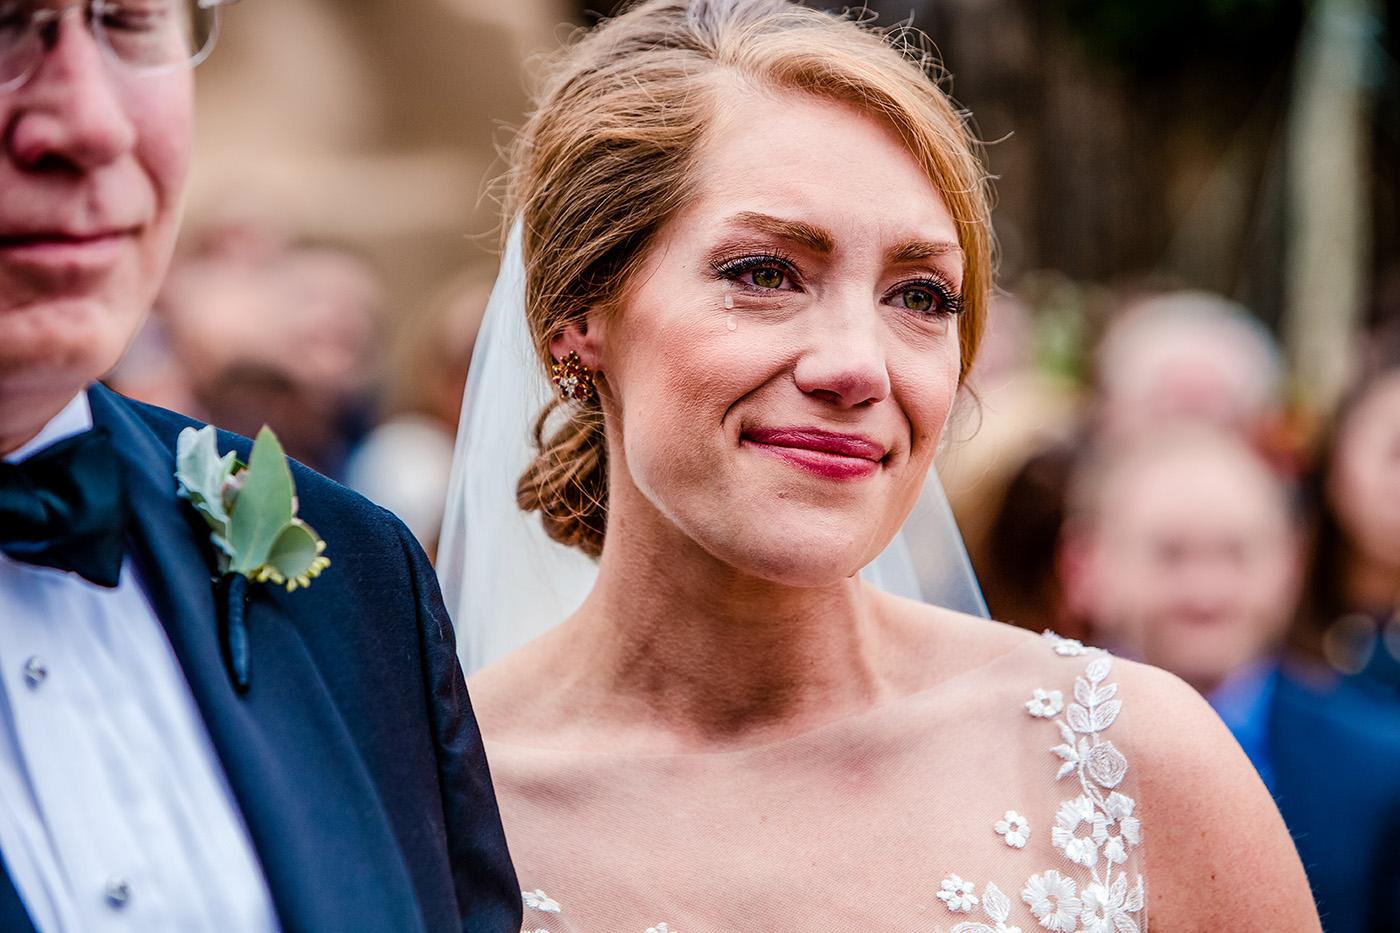 LaPosada-wedding-SantaFe-NewMexico-Carolyn-Tyler-130